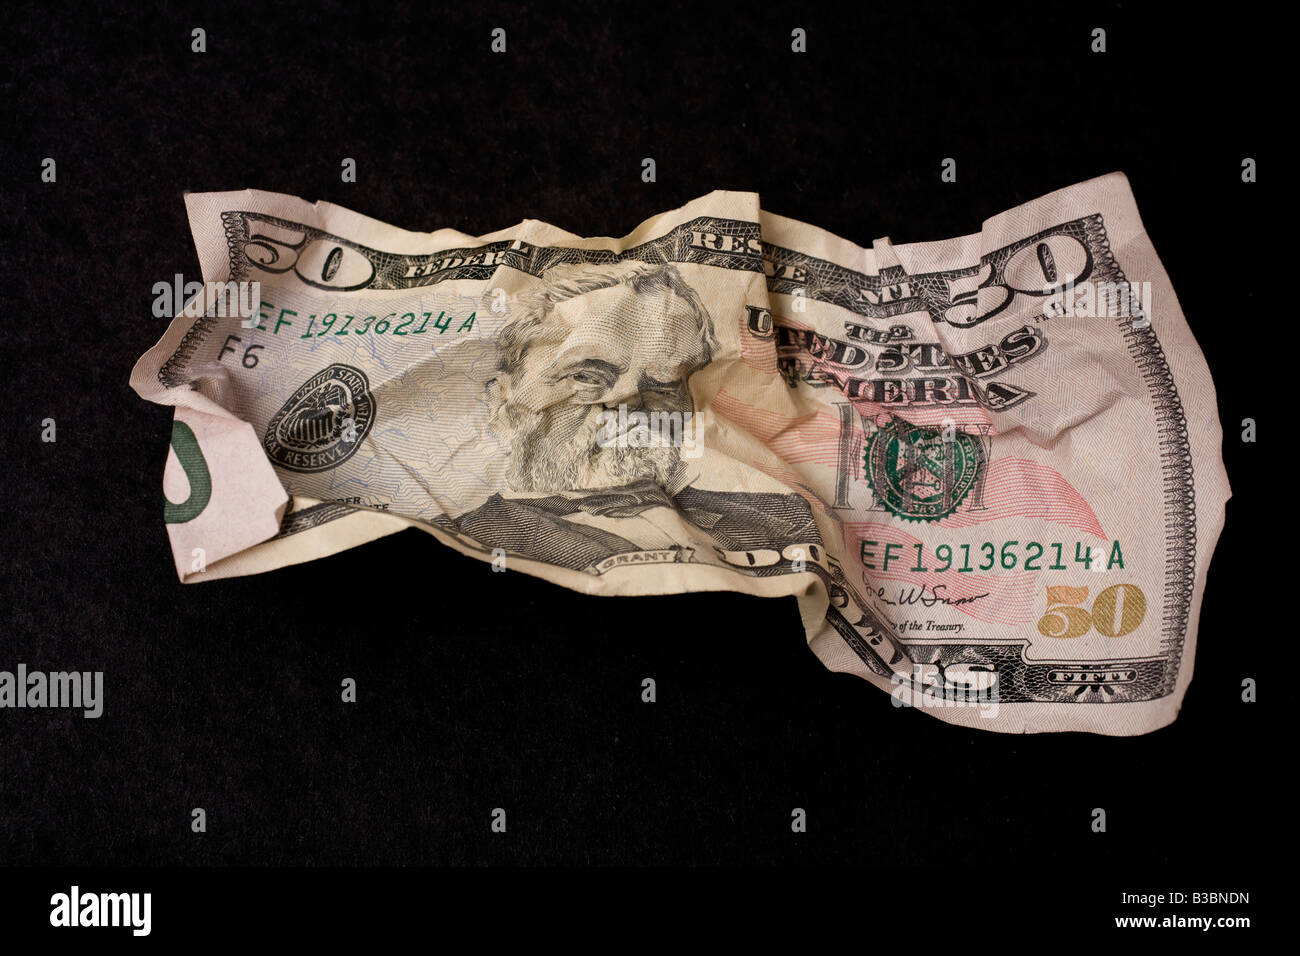 Crumpled $20 US bill - Stock Image